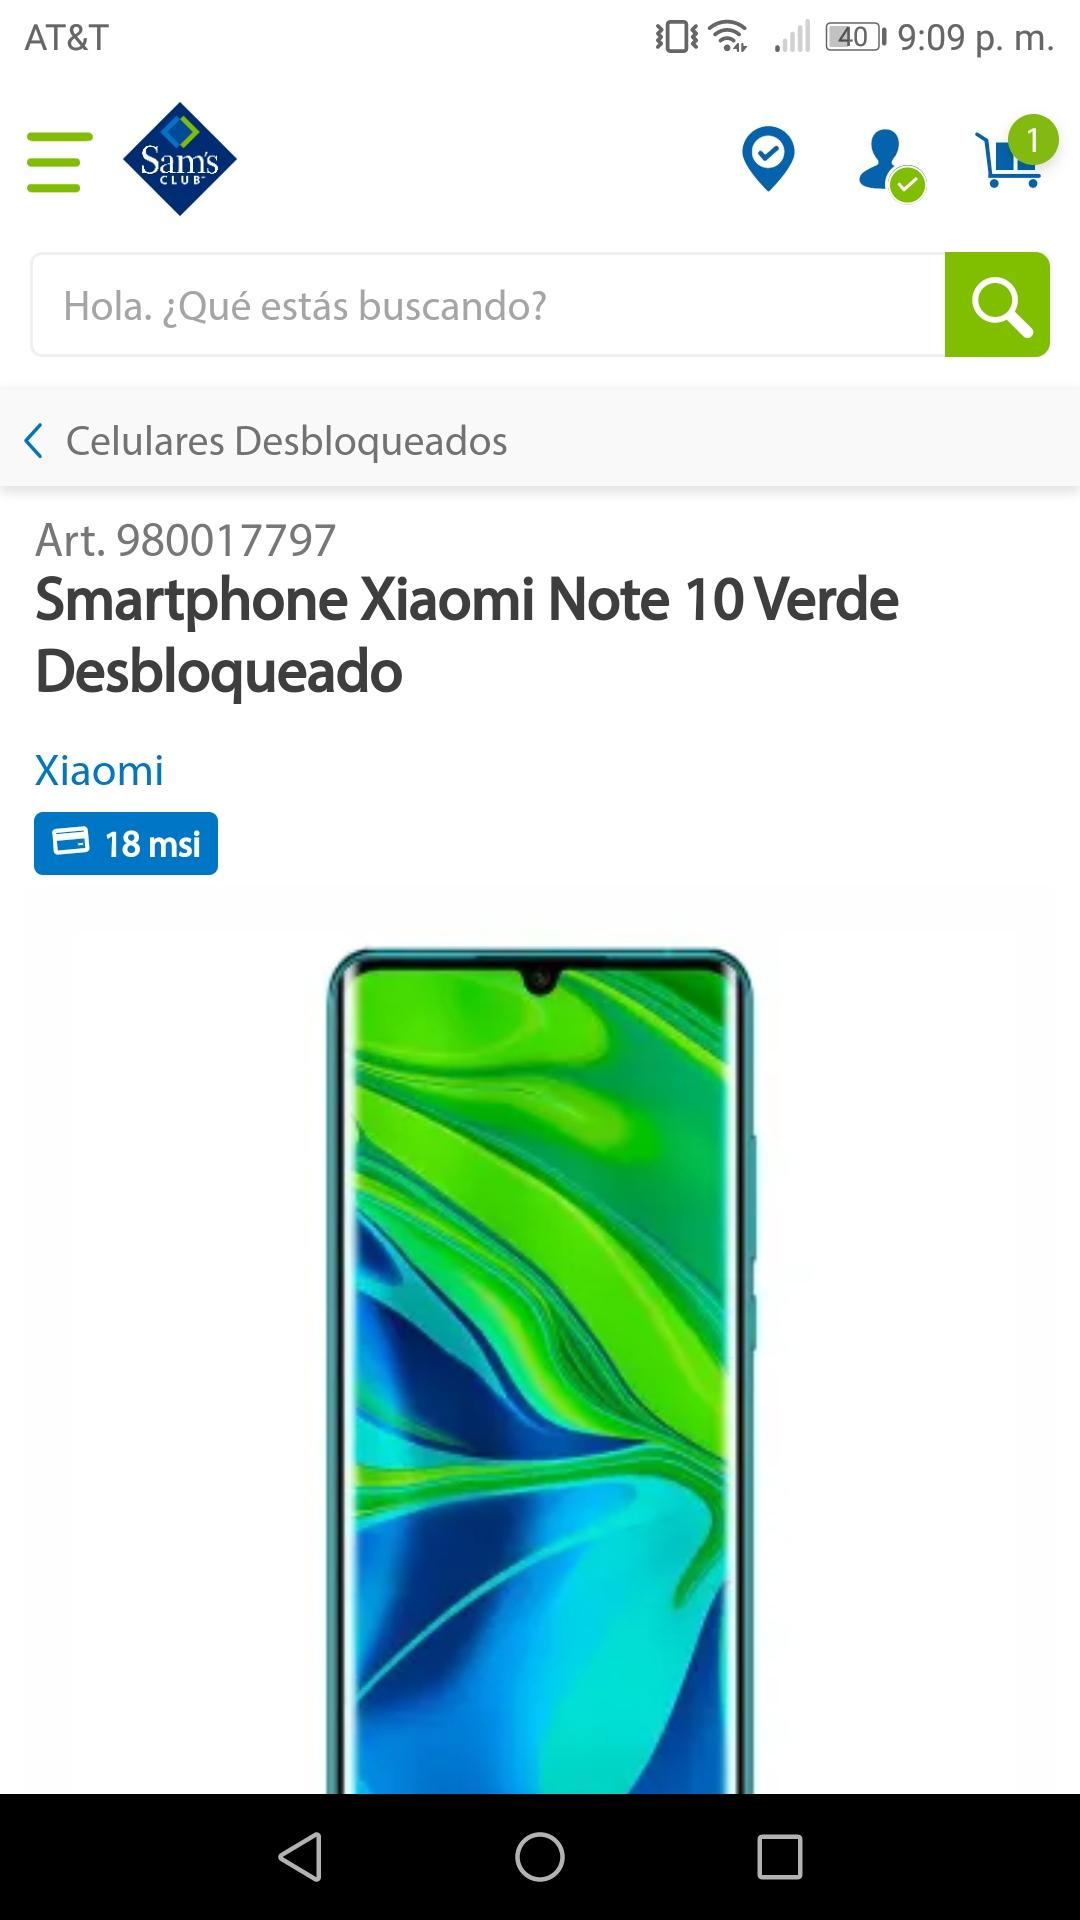 Sam's Club: Smartphone Xiaomi Note 10 Verde Desbloqueado